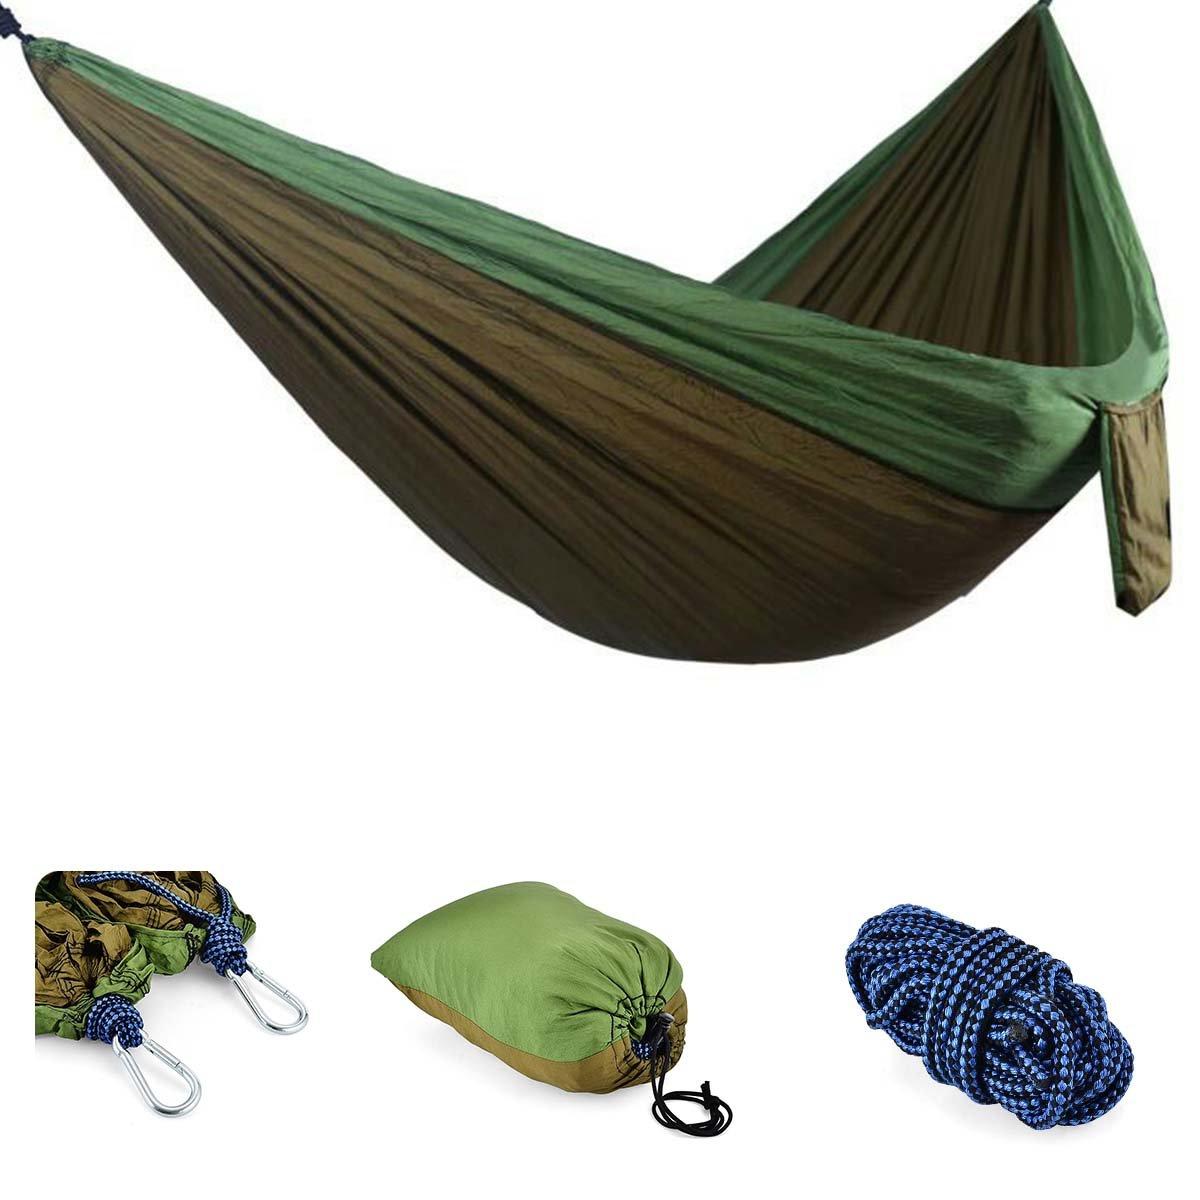 "Kamoキャンプhammock-double 2 Person hammock-軽量ポータブルナイロンハンモックキャンプ、ハイキング、ビーチ、ヤードを、旅行( 118 "" ( L ) X 78 "" ( W ) ) B077M8QSRW Brown & Green Brown & Green"